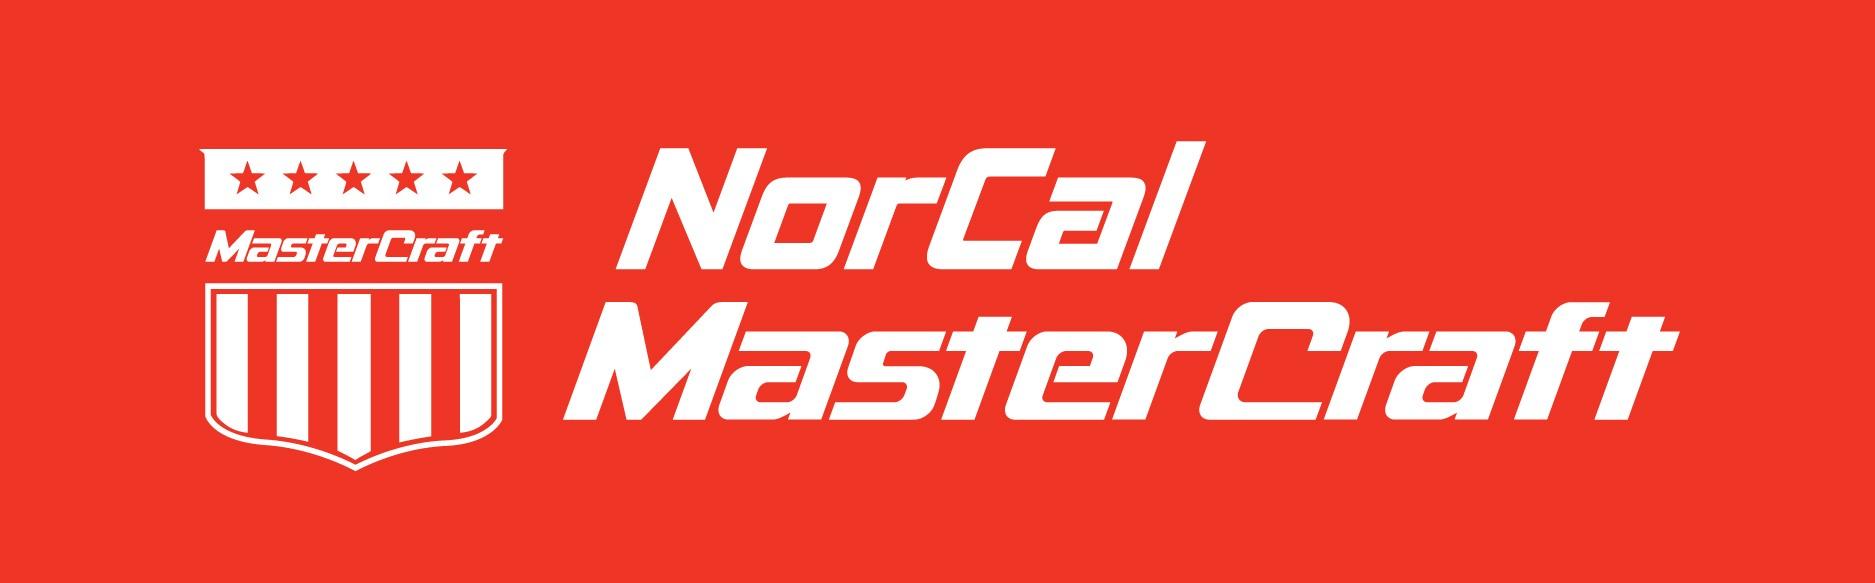 NCMC Logo 2017 900x280px 01